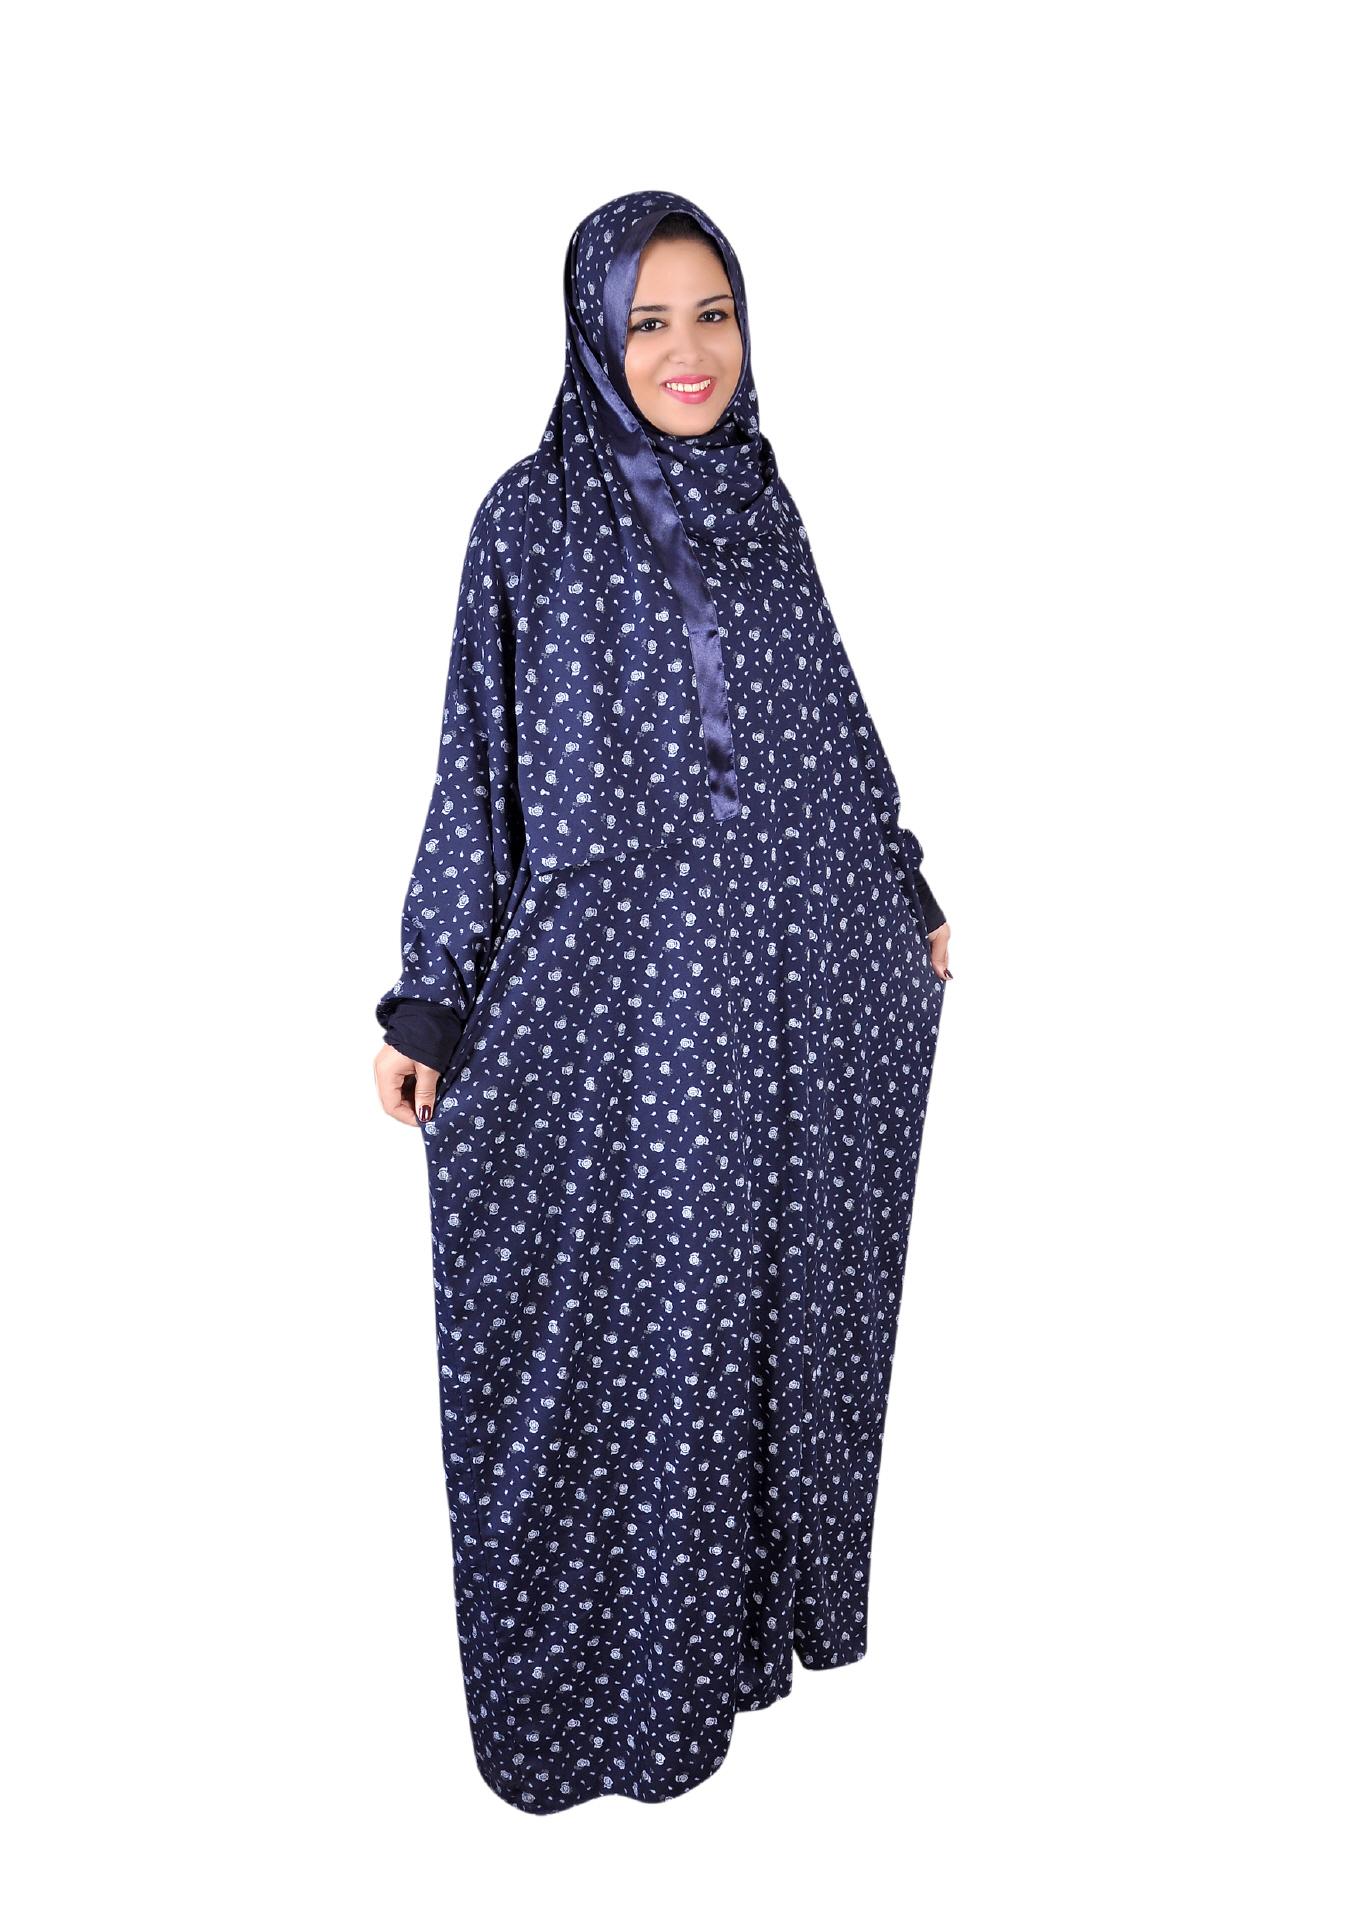 isdal islamische kleidung hijab online kaufen egypt. Black Bedroom Furniture Sets. Home Design Ideas